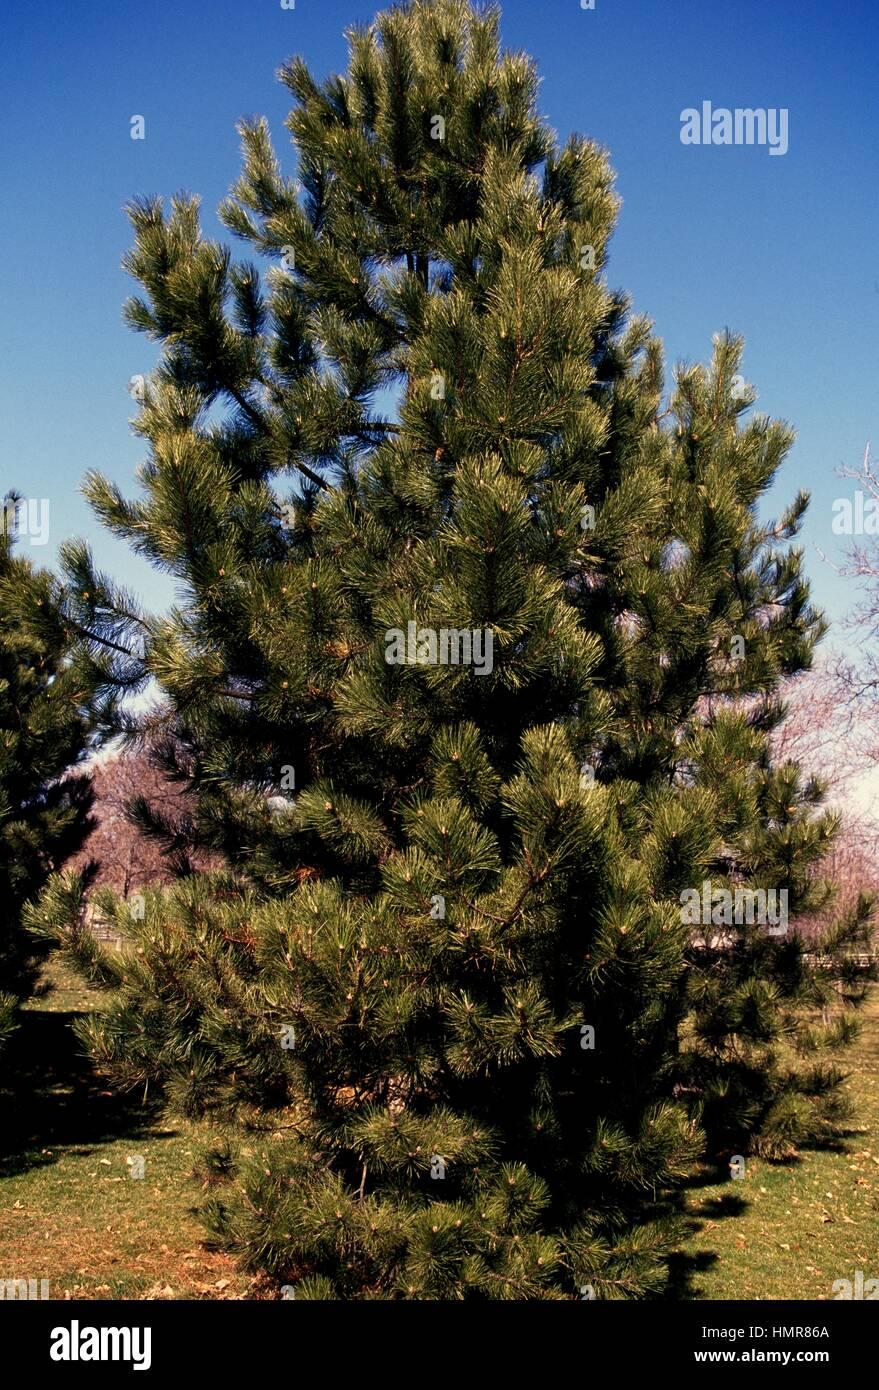 Swiss pine or Arolla pine (Pinus cembra), Pinaceae. - Stock Image